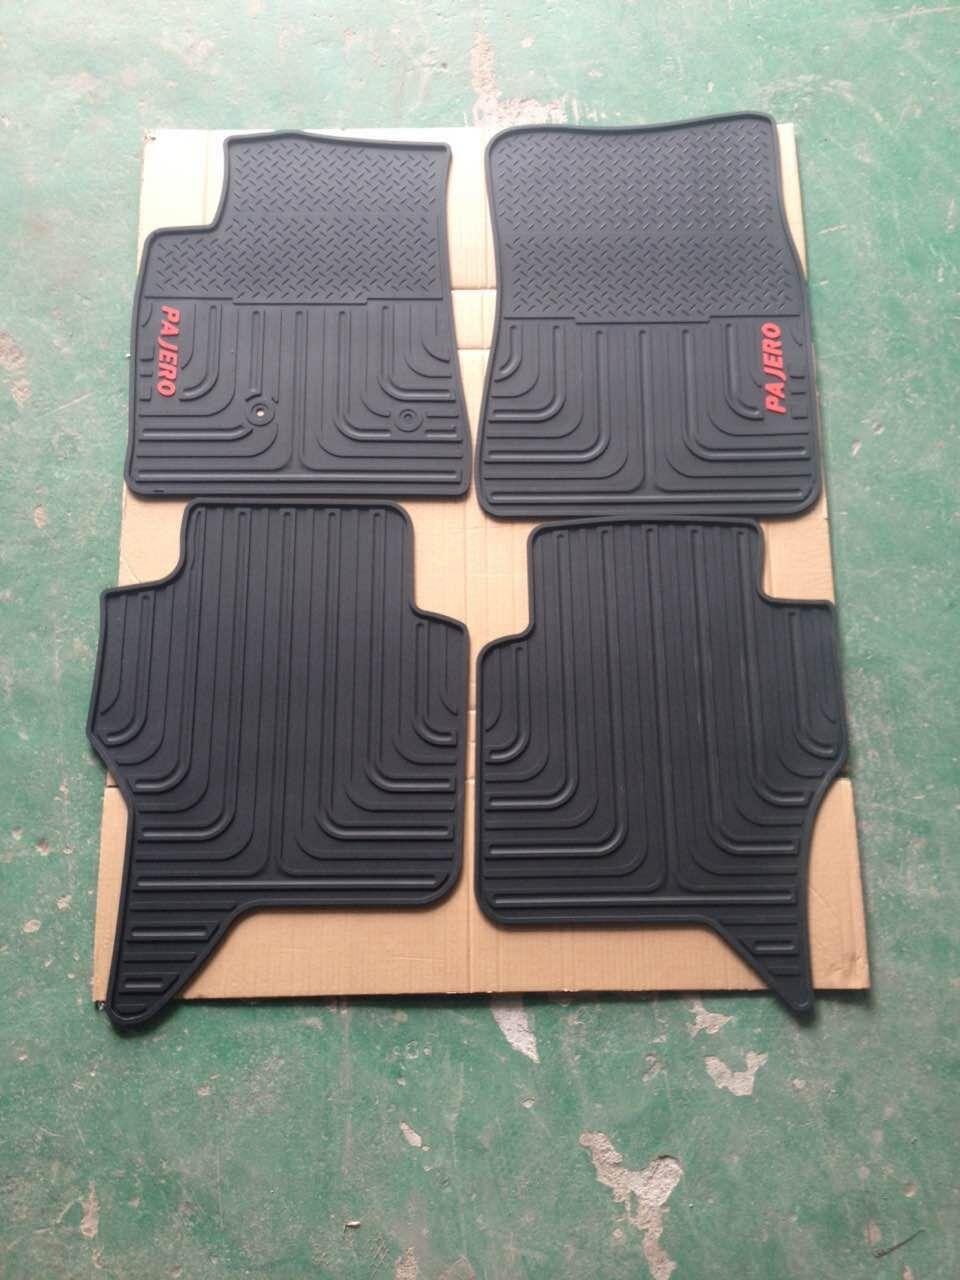 Floor mats in spanish - Dedicated No Odor Rubber Car Floor Mats Green Latex Carpets For Mitsubishi Pajero Sport 2016 Environmental